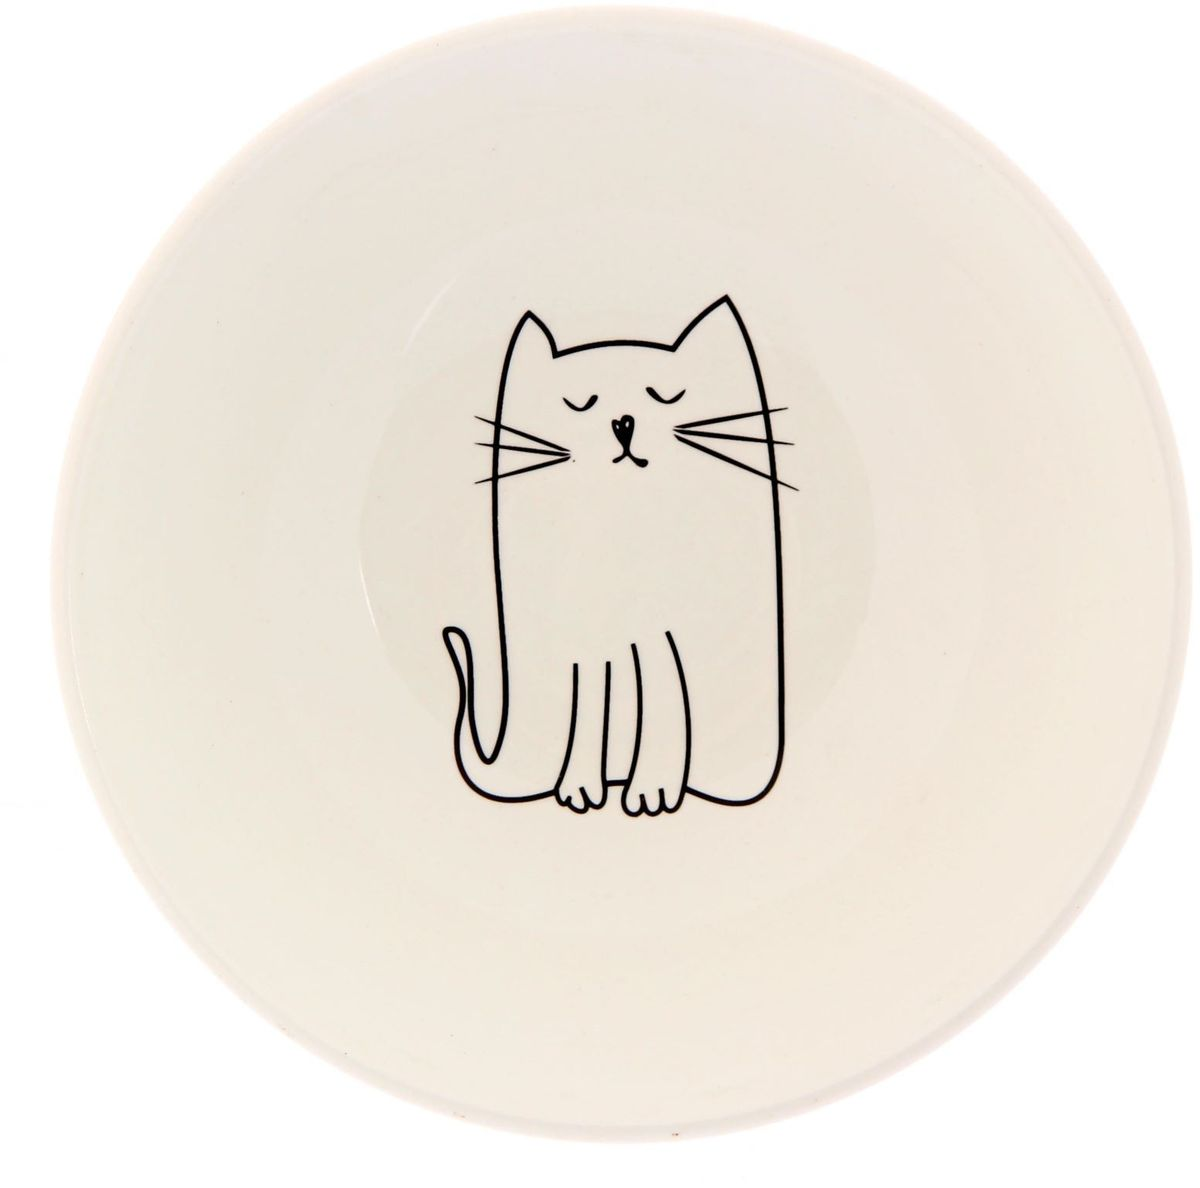 Салатник Сотвори чудо Киска, диаметр 16,5 см тарелка сотвори чудо киска диаметр 23 см